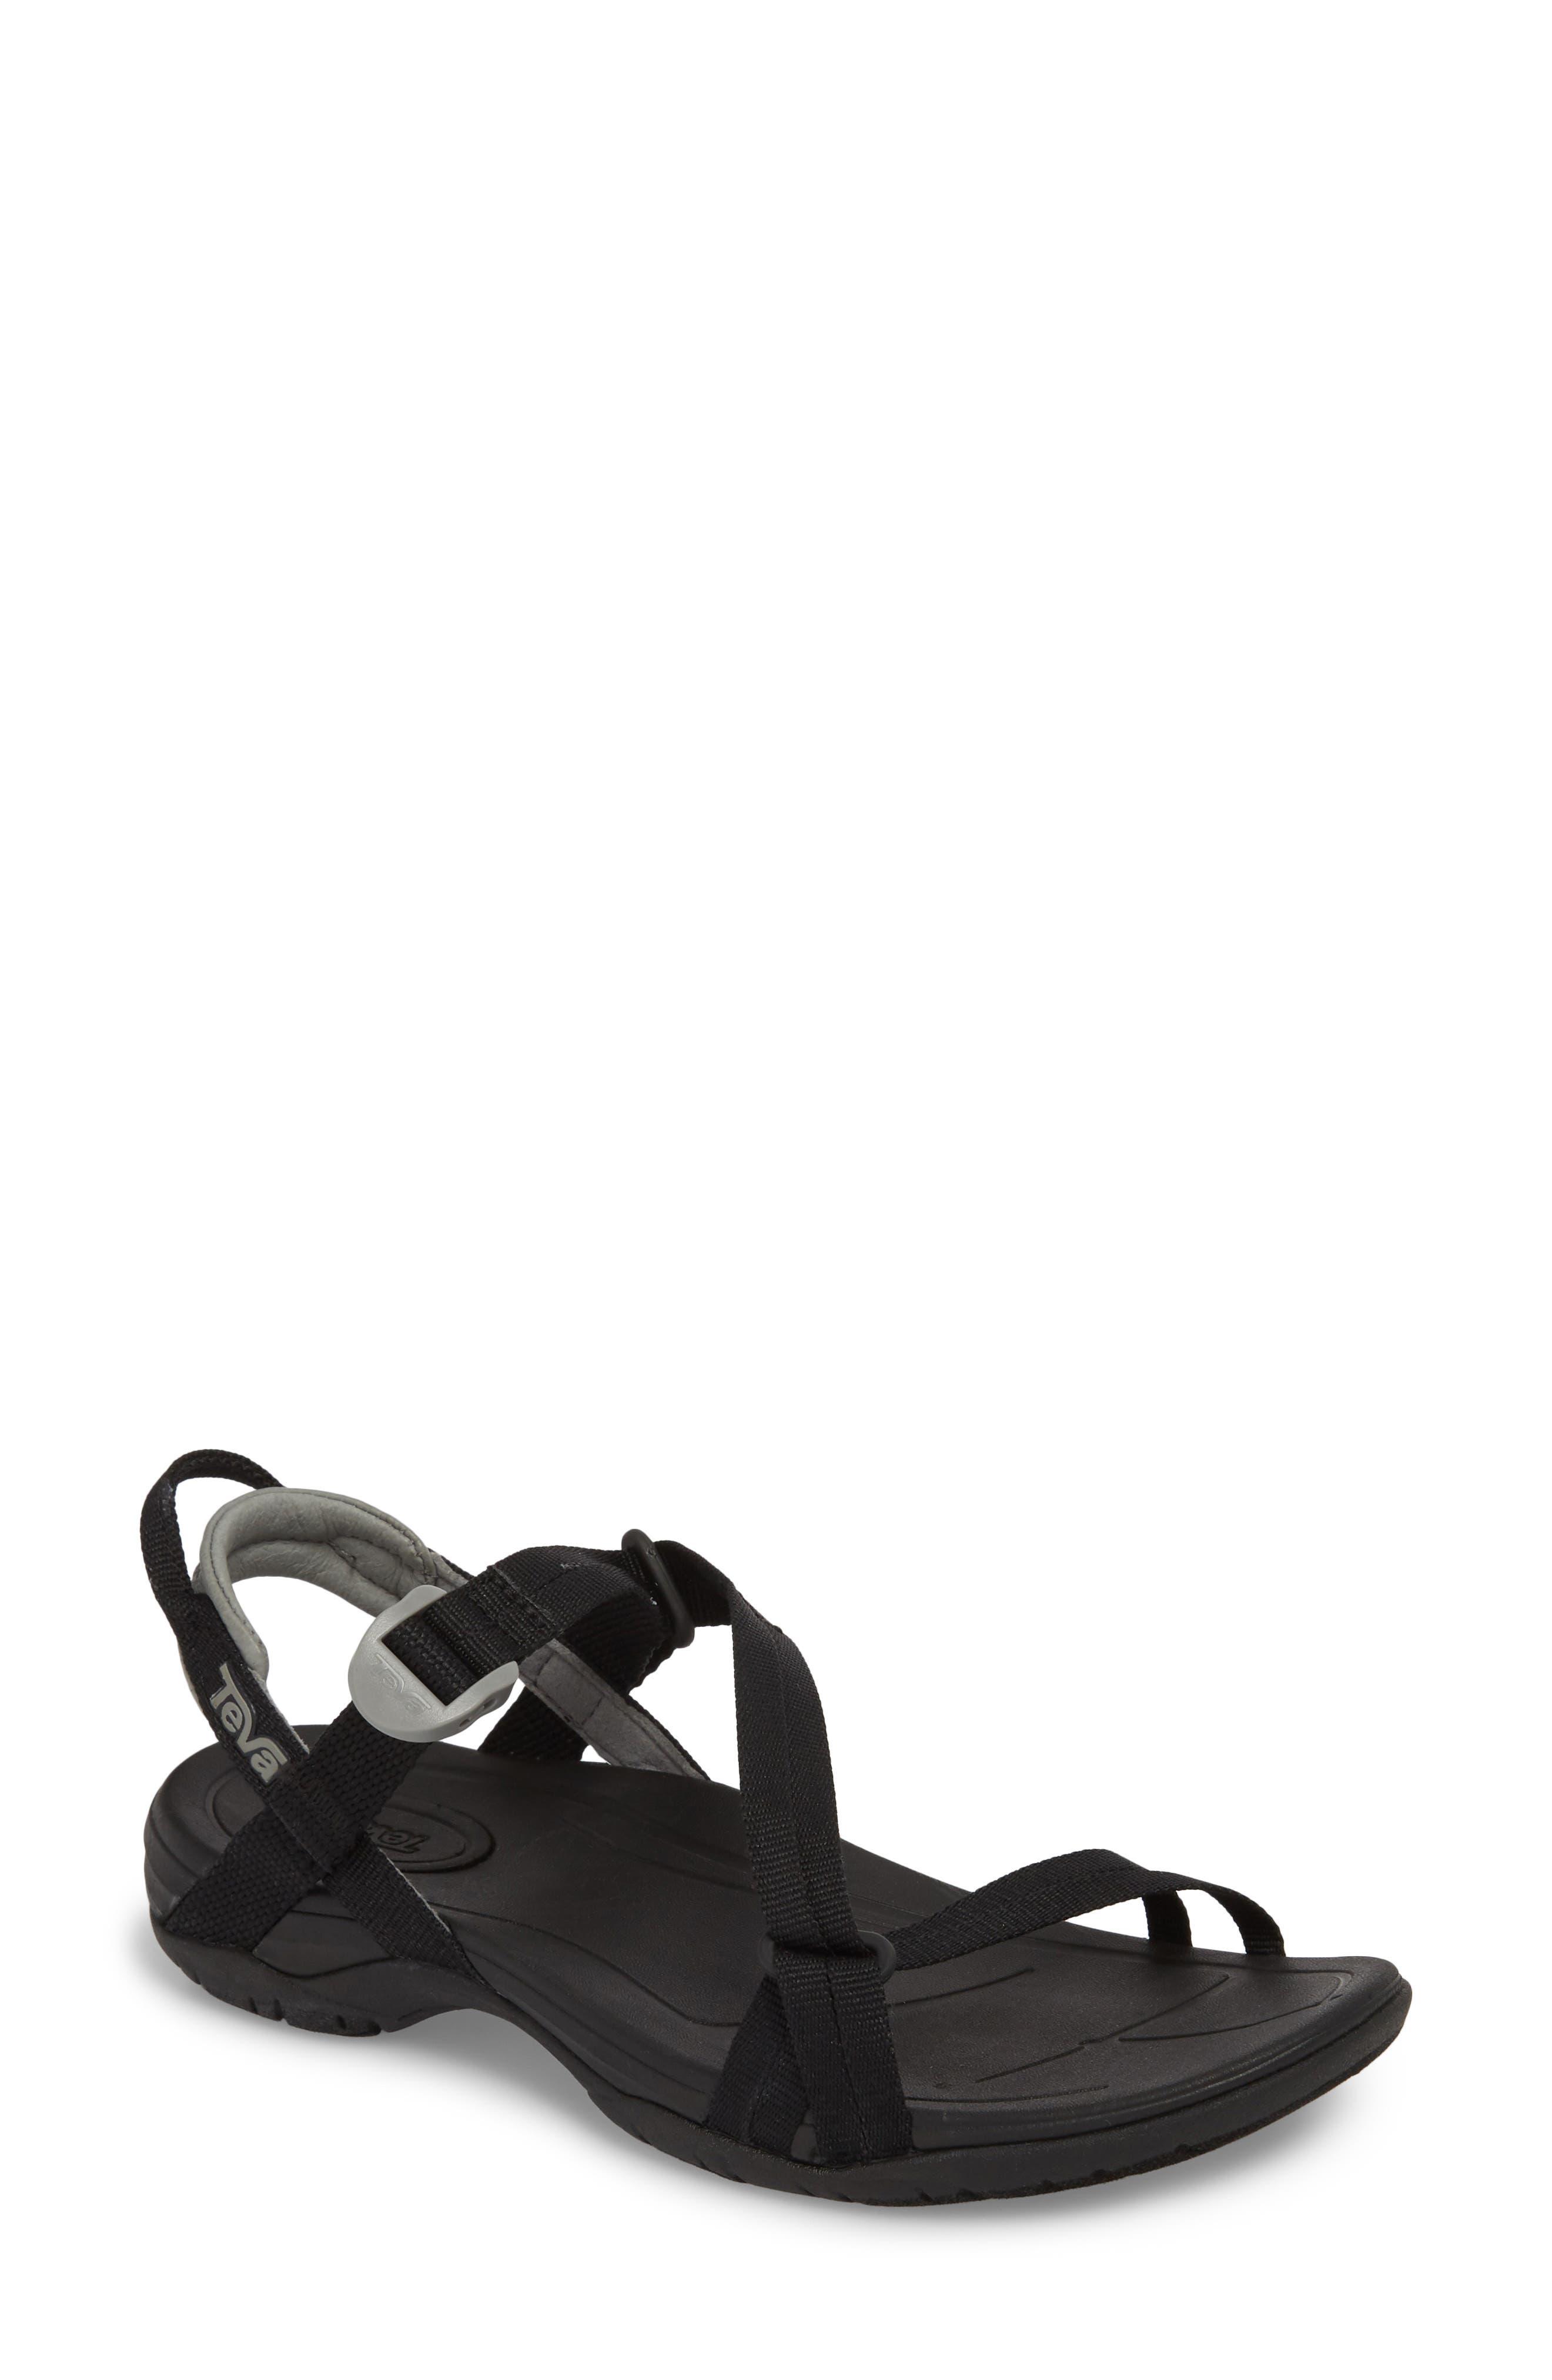 Sirra Sandal,                         Main,                         color, BLACK